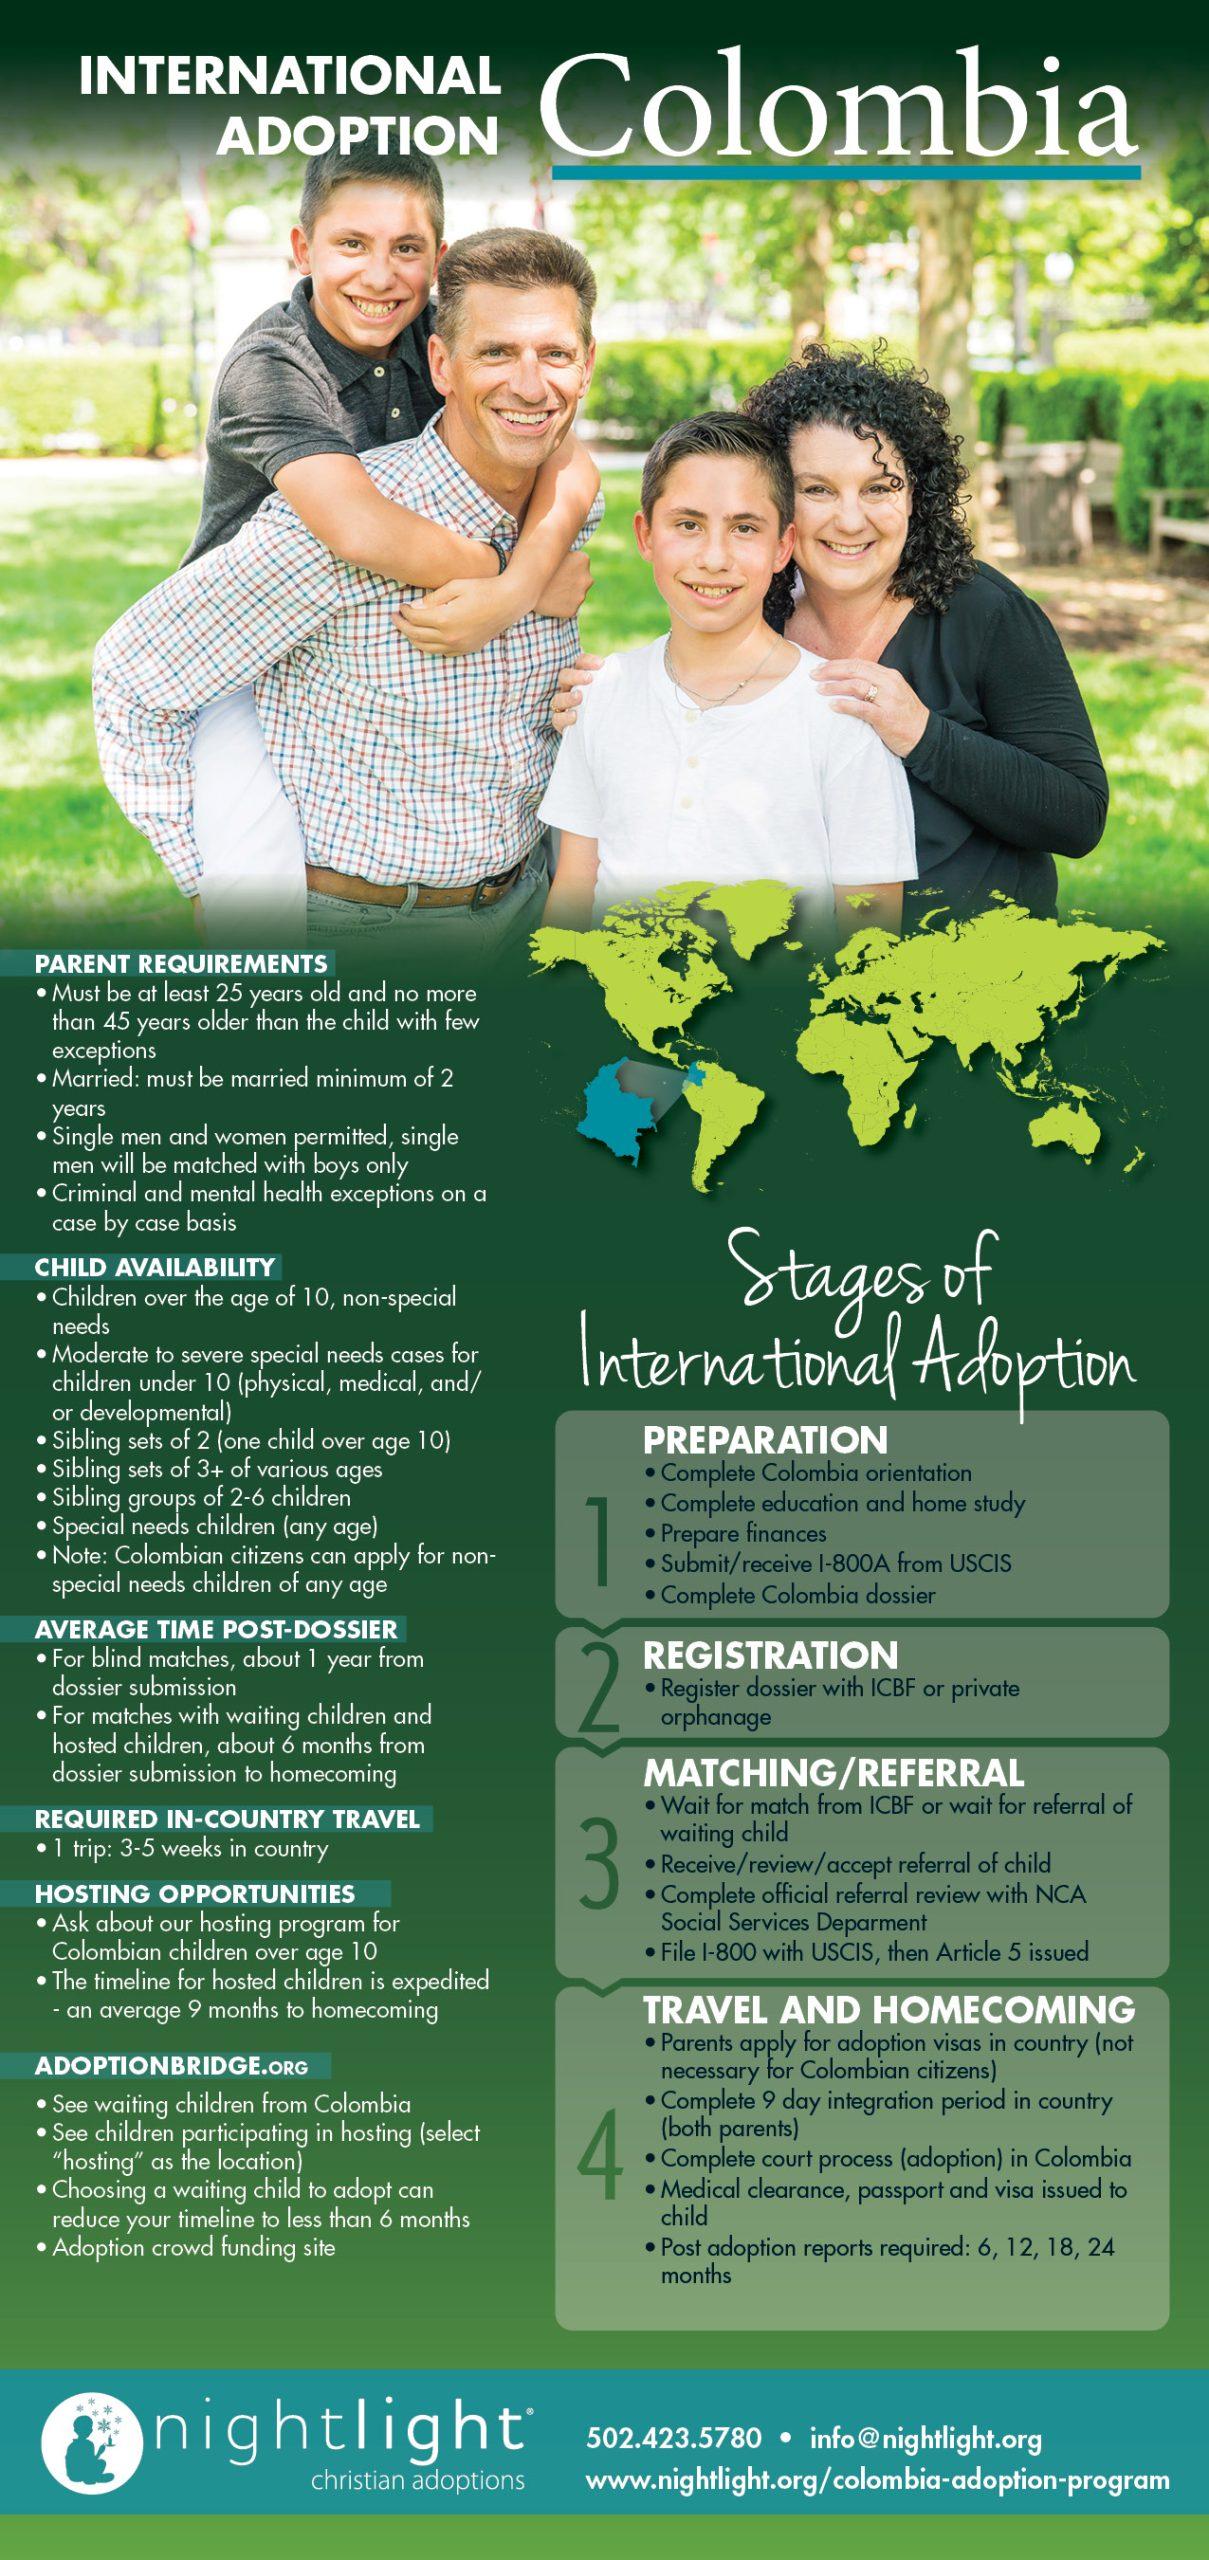 Colombia Adoption